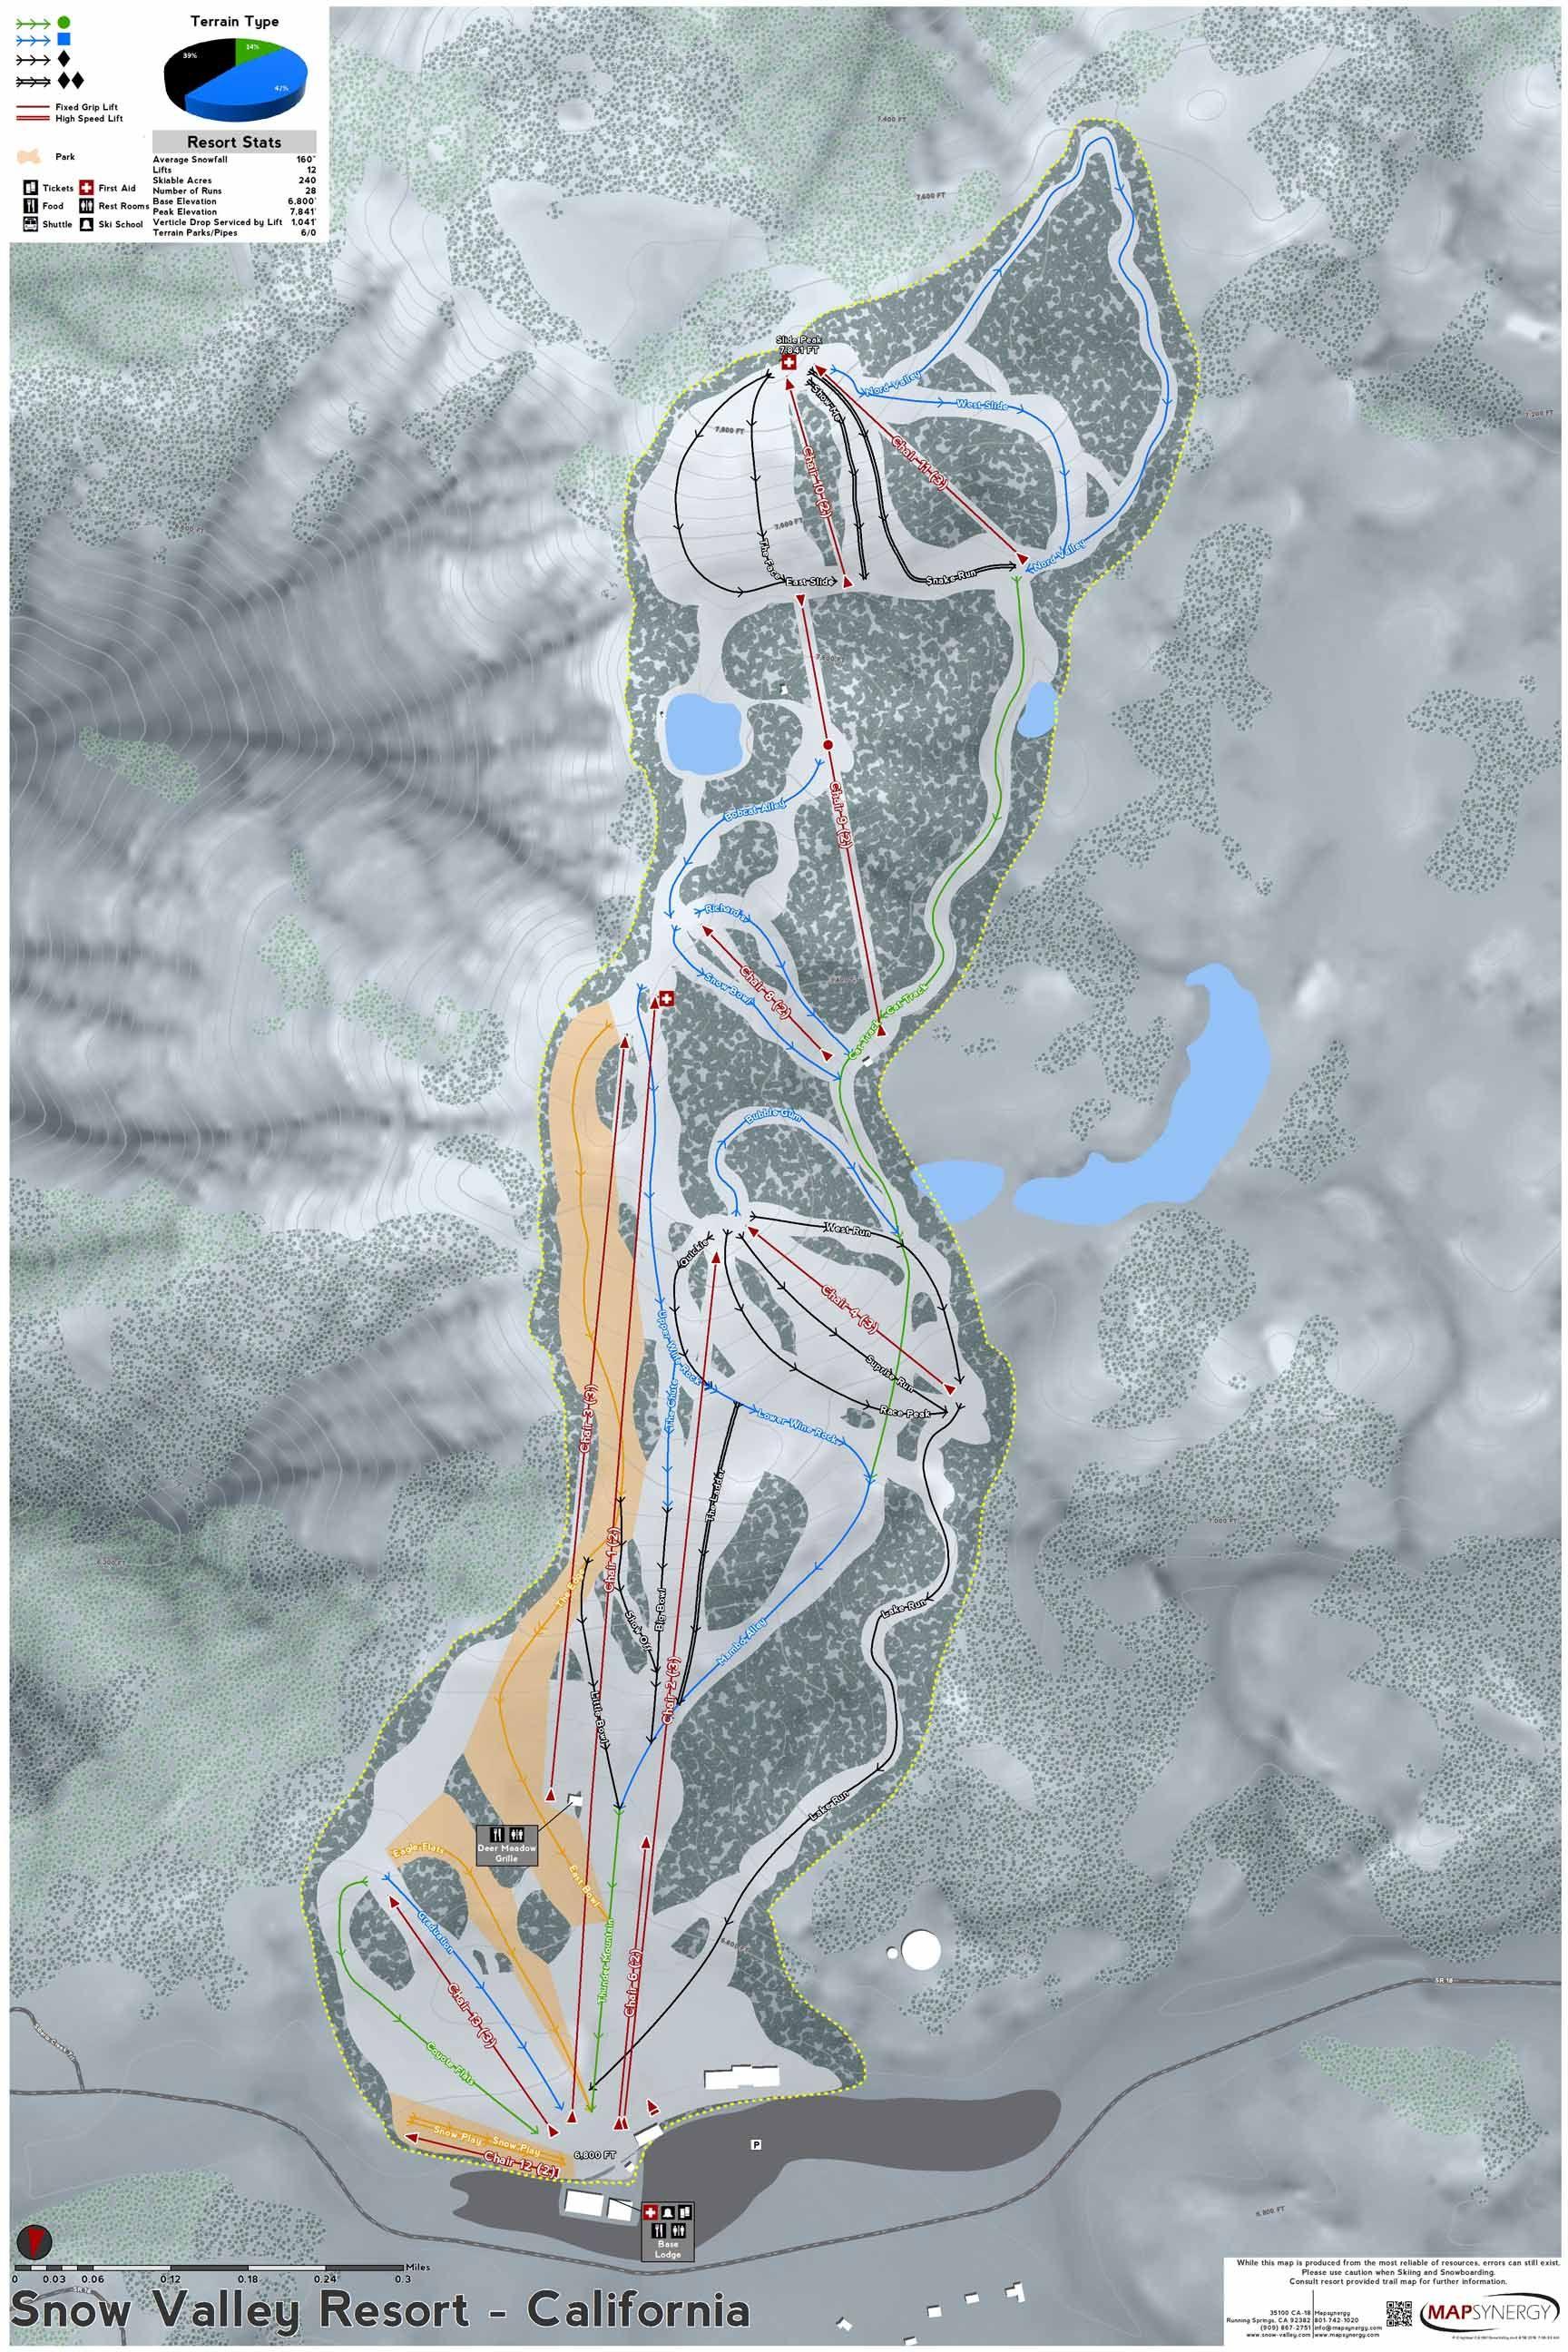 Worksheet. Snow Valley Resort ski map  California Ski Resort Maps